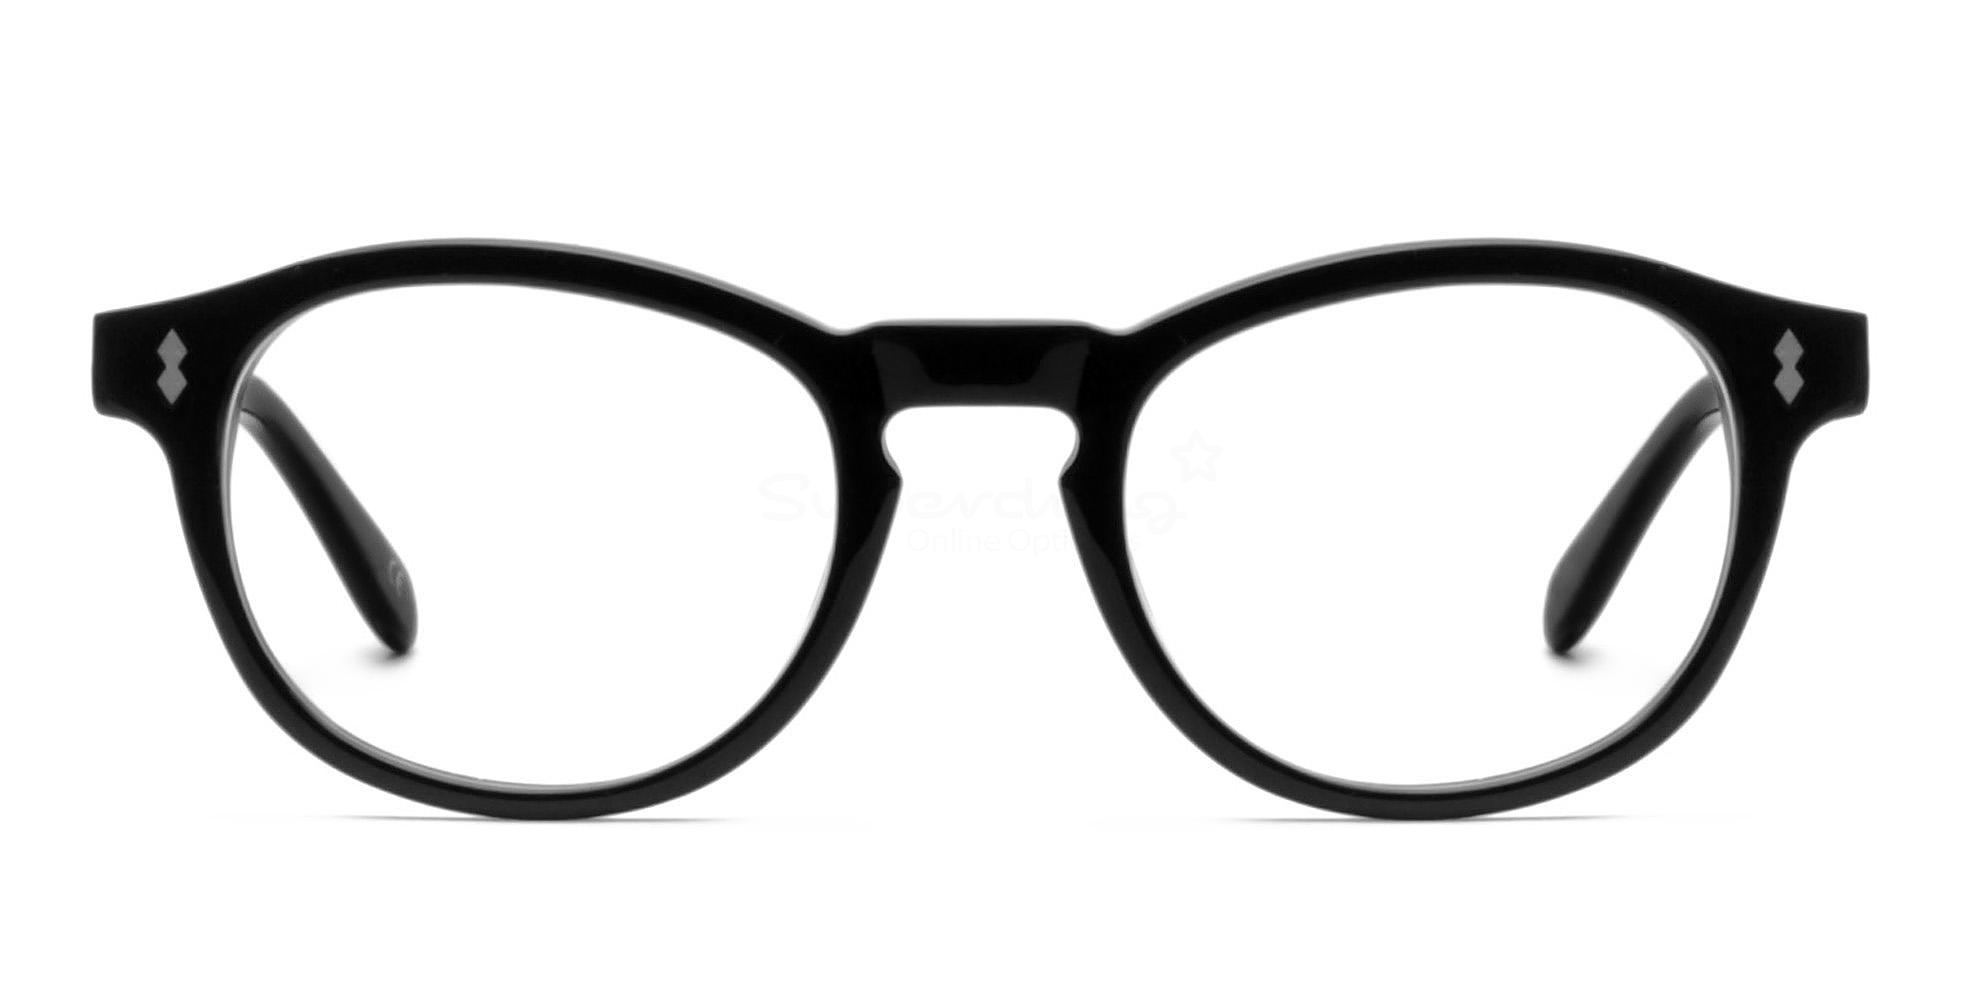 C1 SD2114 Glasses, Krypton